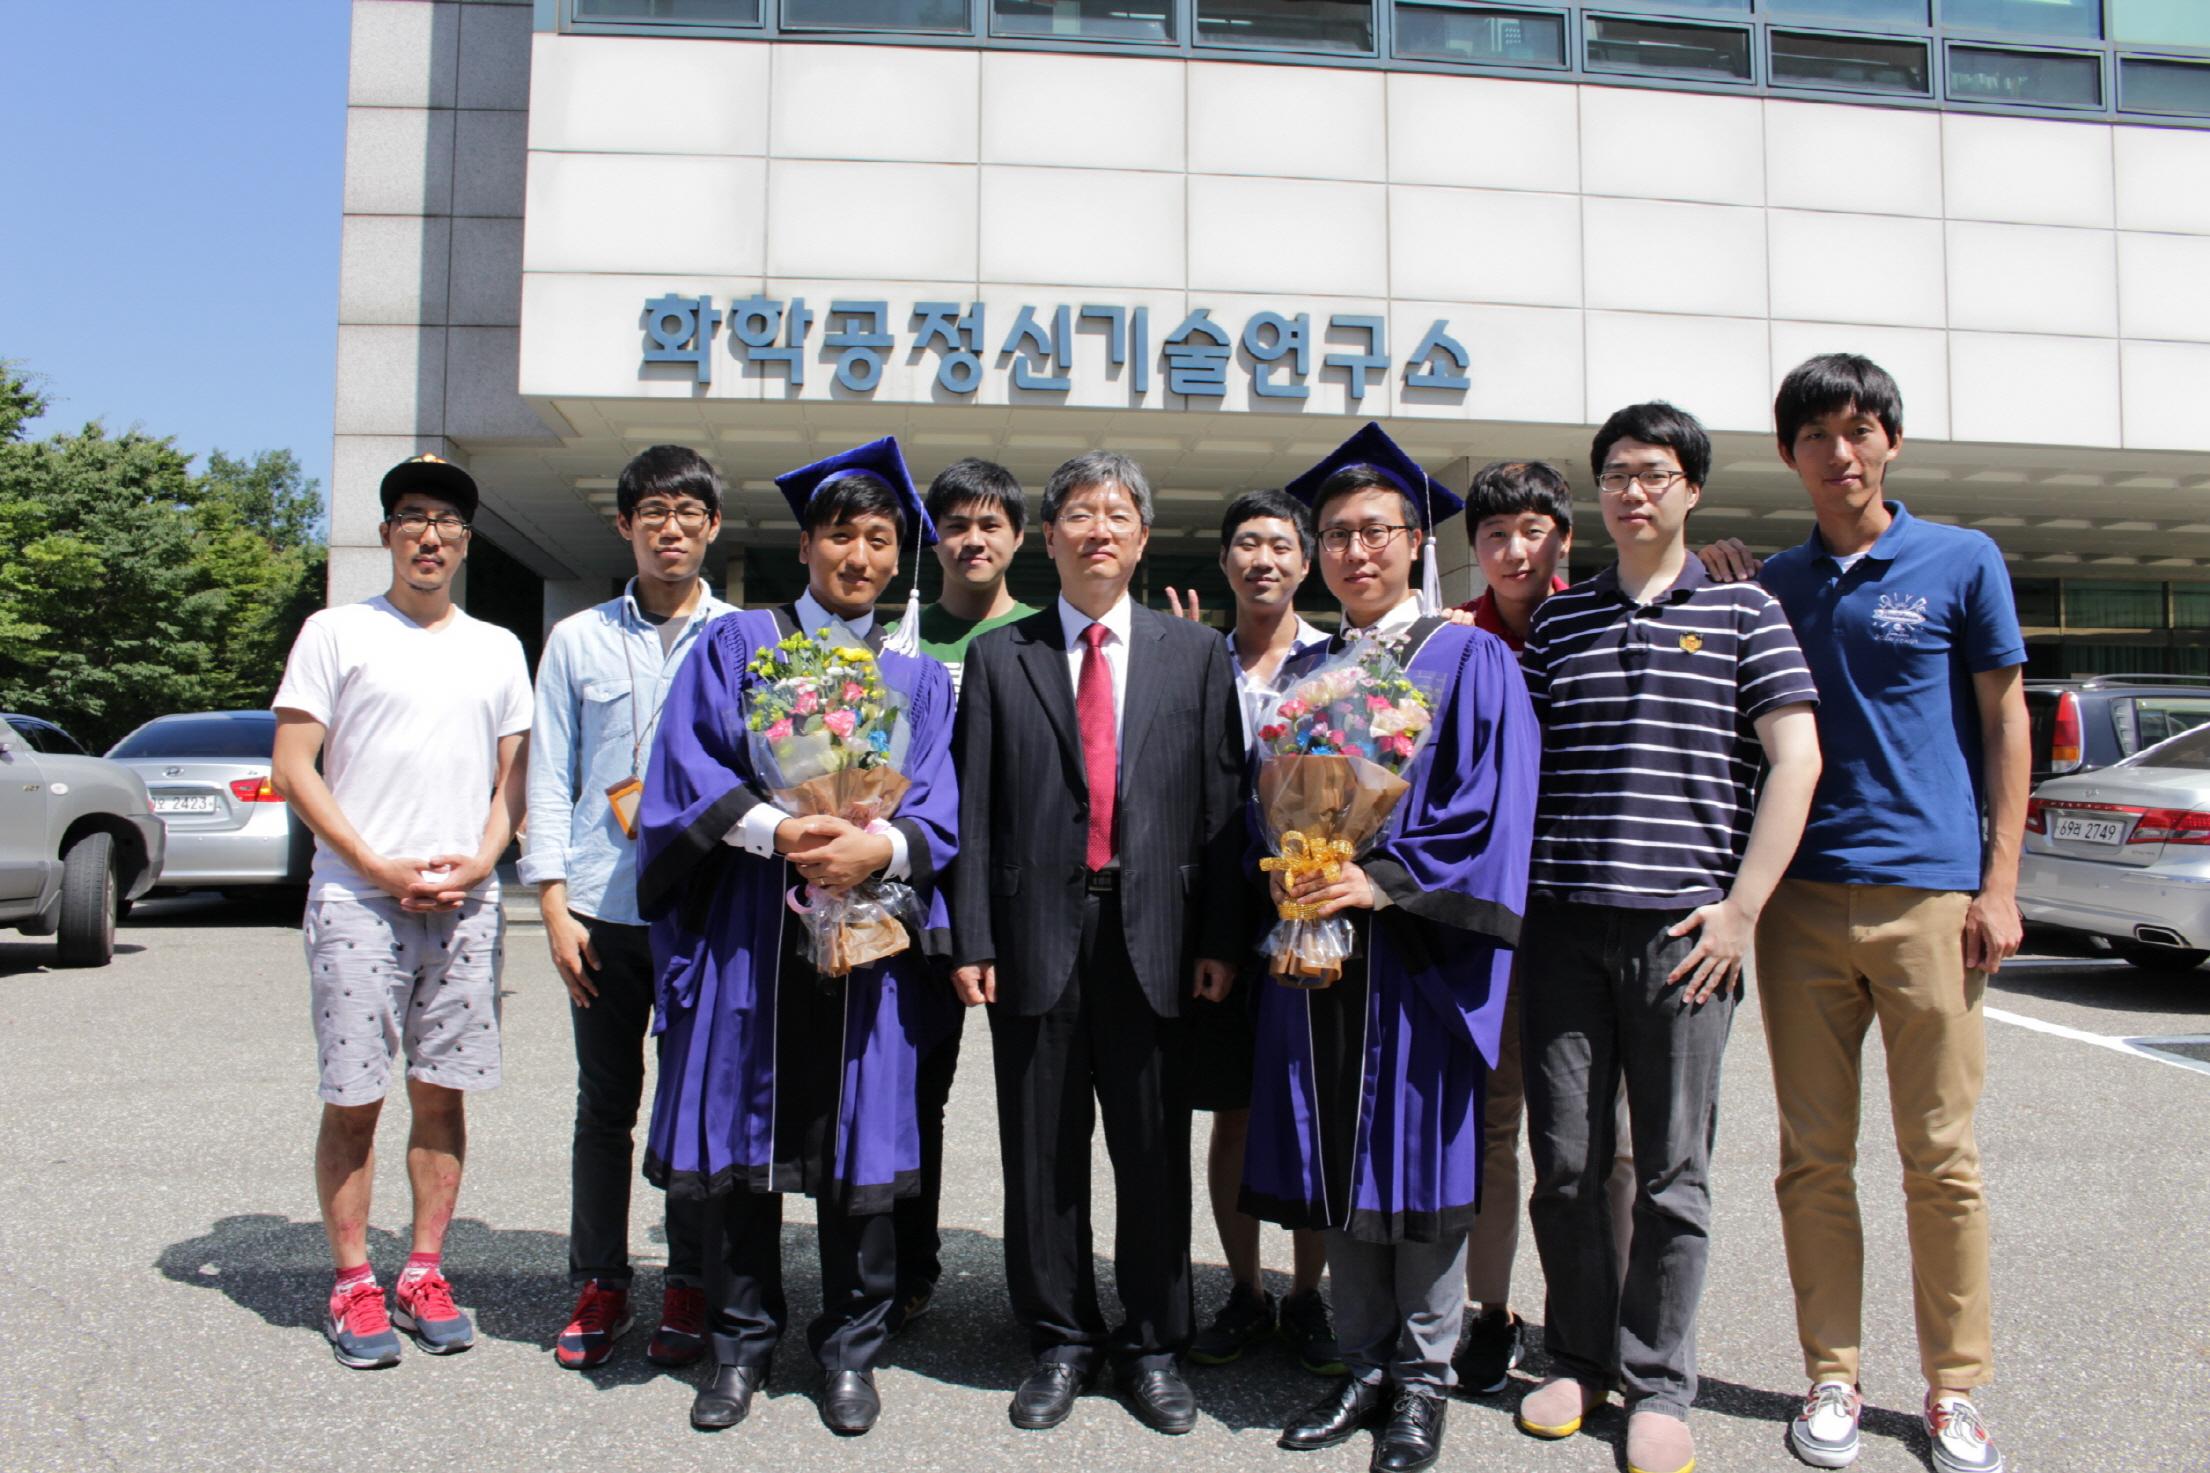 2014 8 graduation 4.JPG